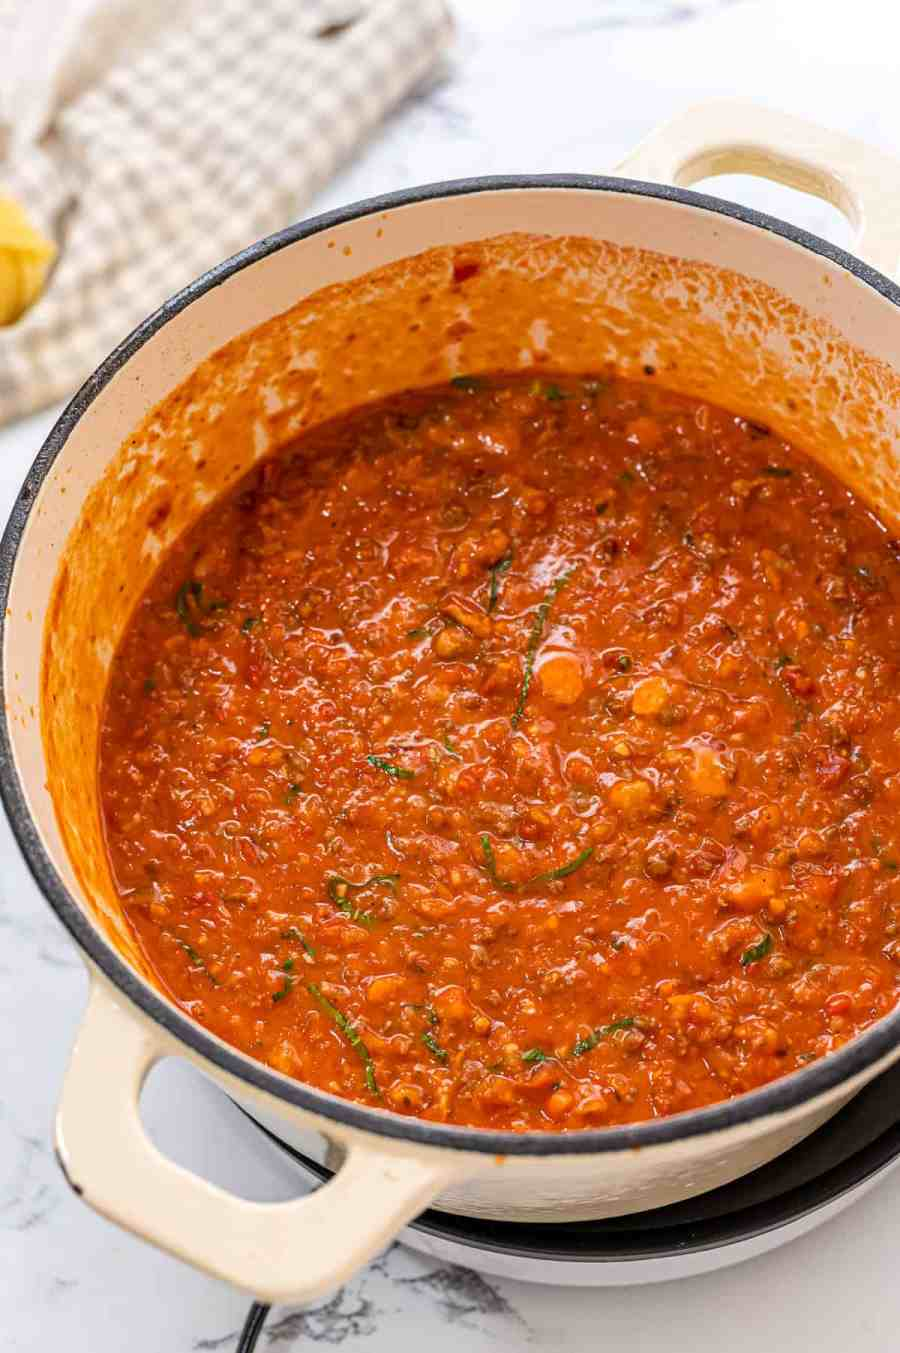 Saucepan with homemade bolognese sauce.